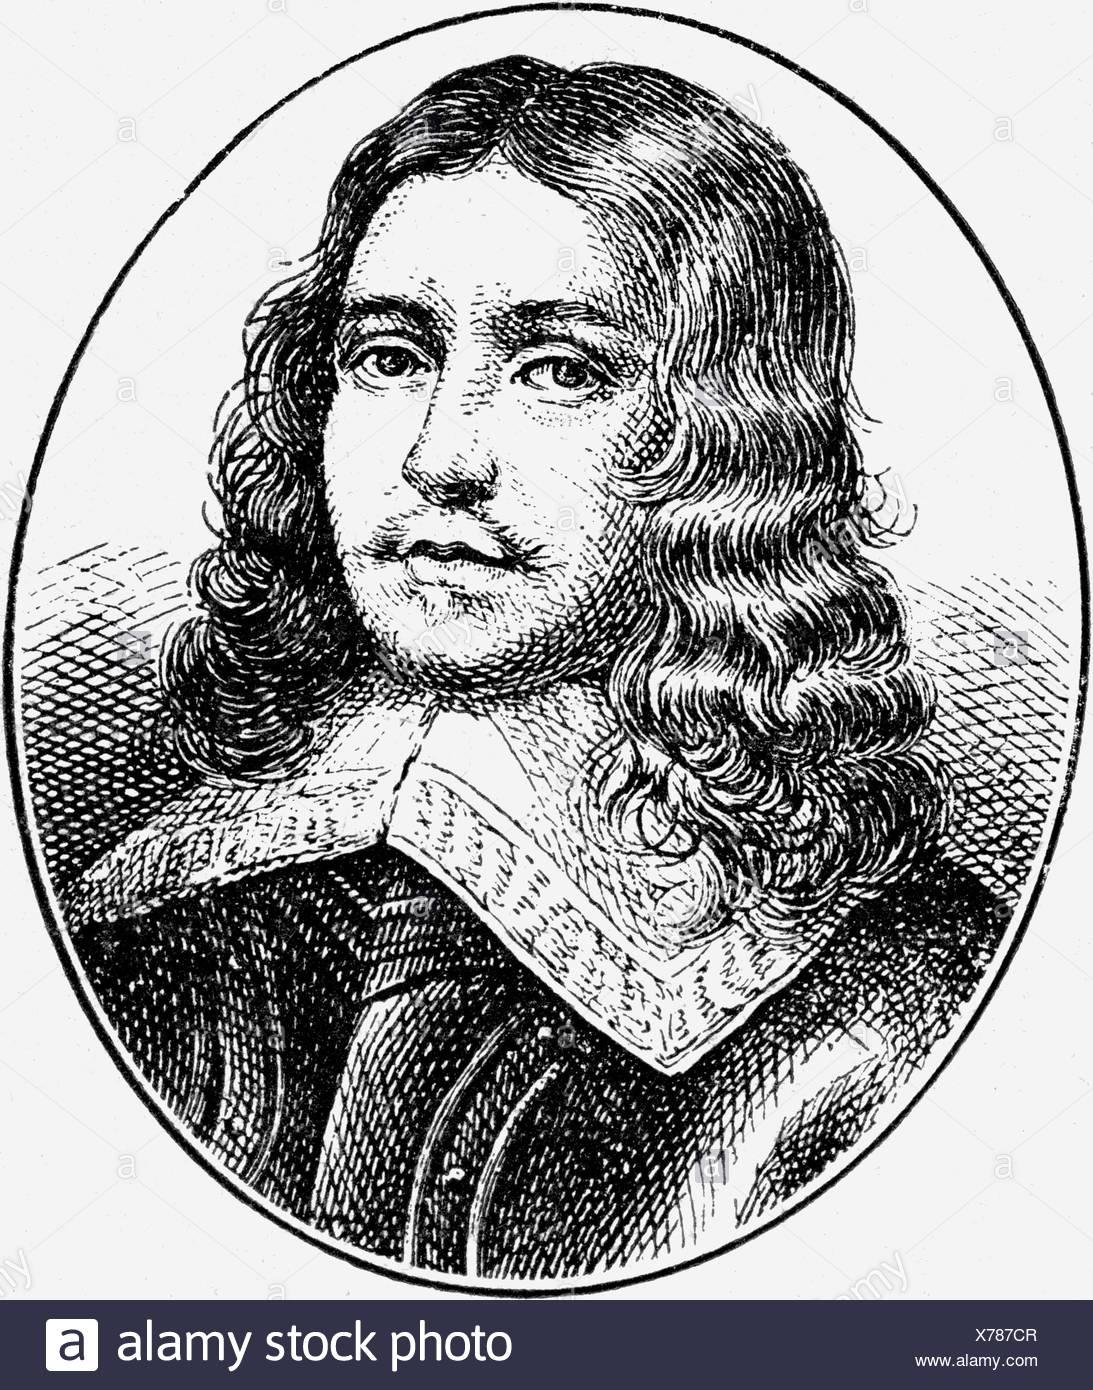 Cromwell, Richard, 4.10.1626 - 12.7.1712, político inglés, Lord Protector 3.9.1658 - 24.5.1659, retrato, grabado, siglo XIX, política, Inglaterra, Escocia, Irlanda, siglo XVII, , Foto de stock